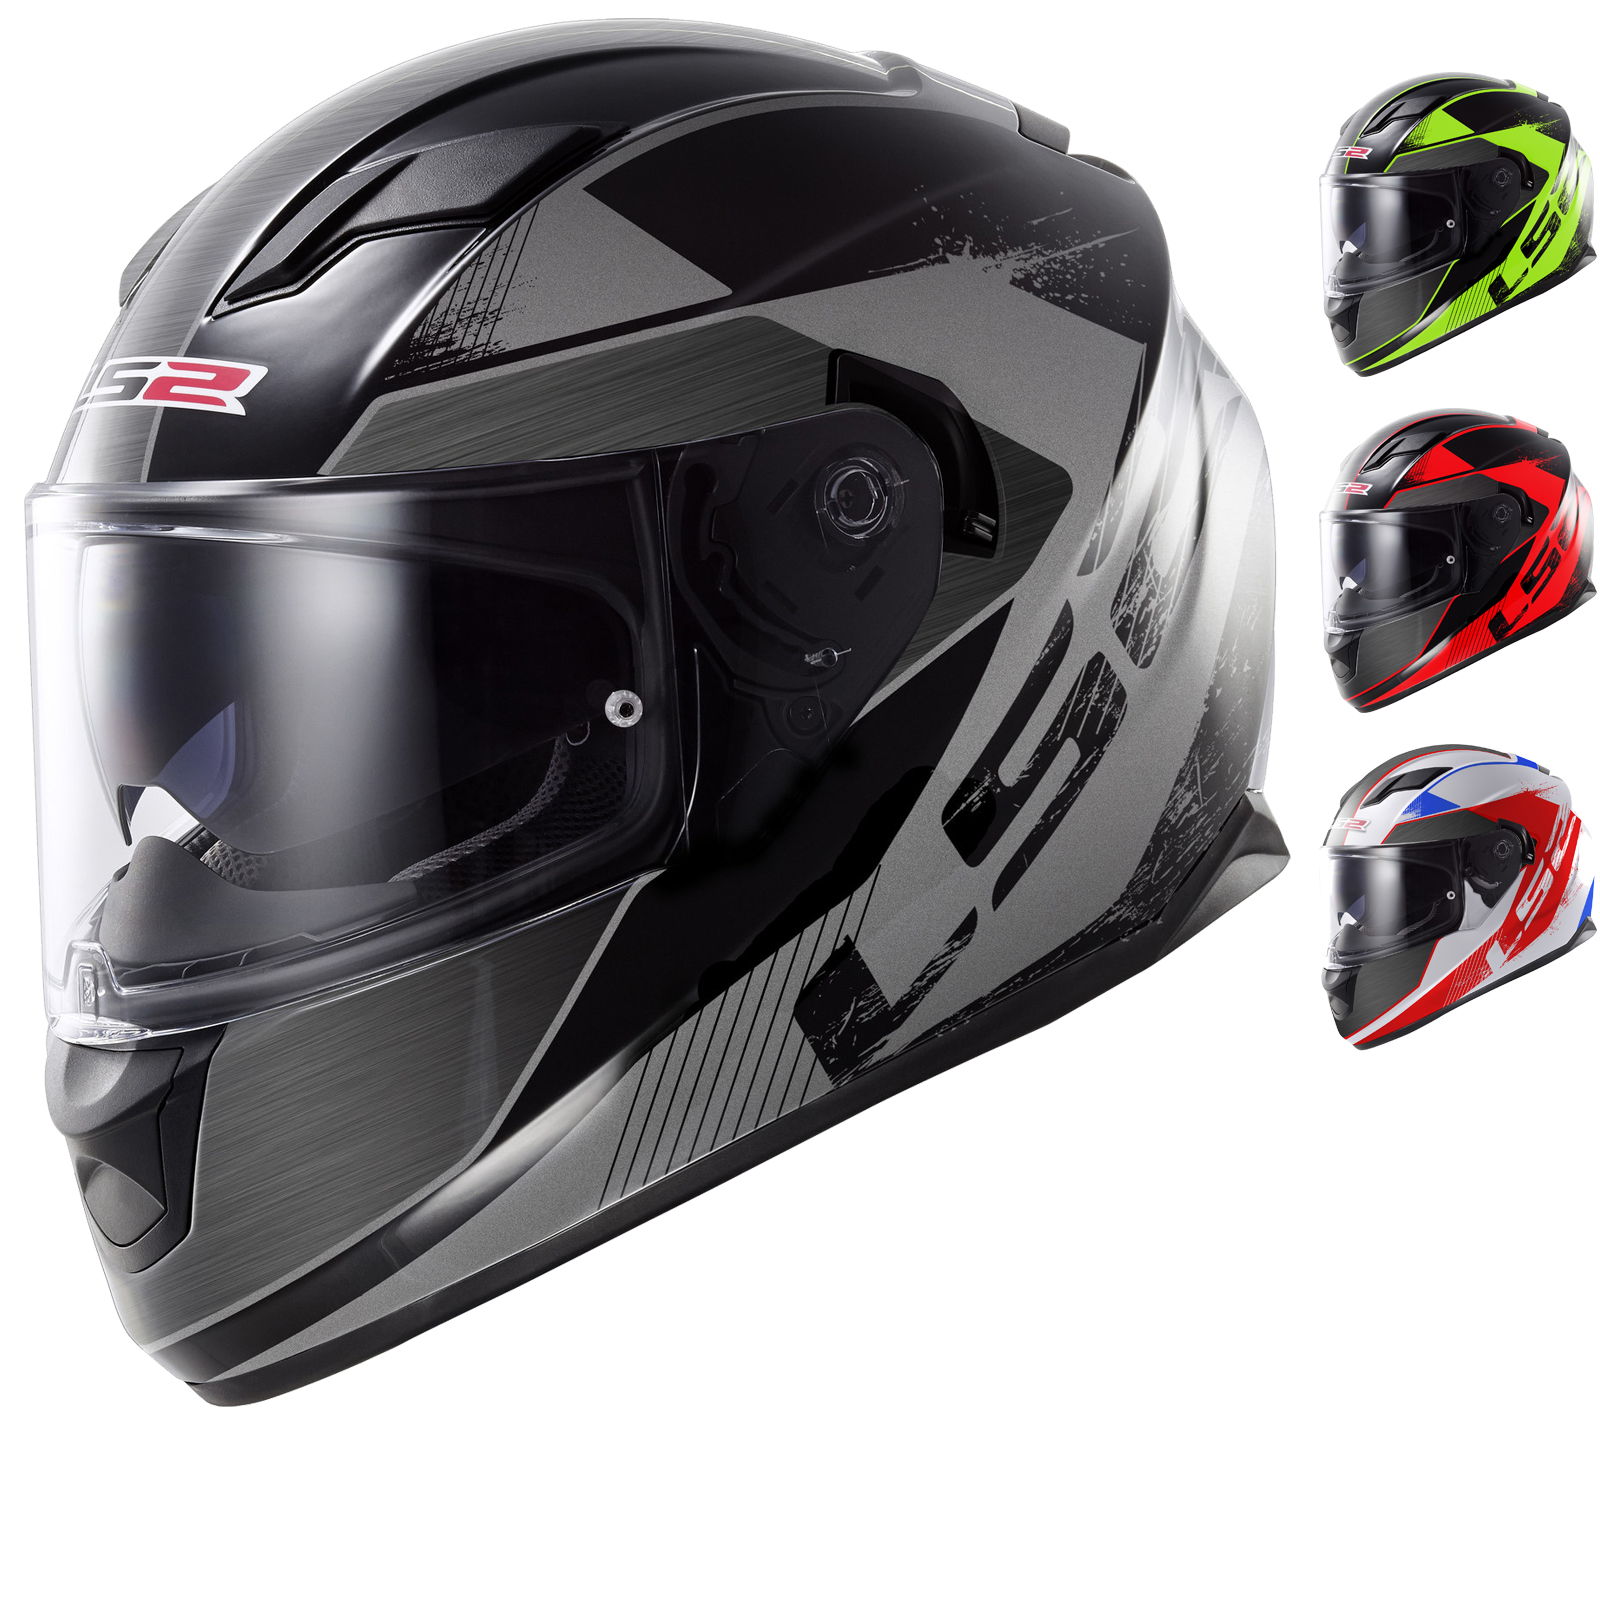 Lightweight Motorcycle Helmet >> LS2 FF320 Stream Stinger Motorcycle Helmet - Full Face ...